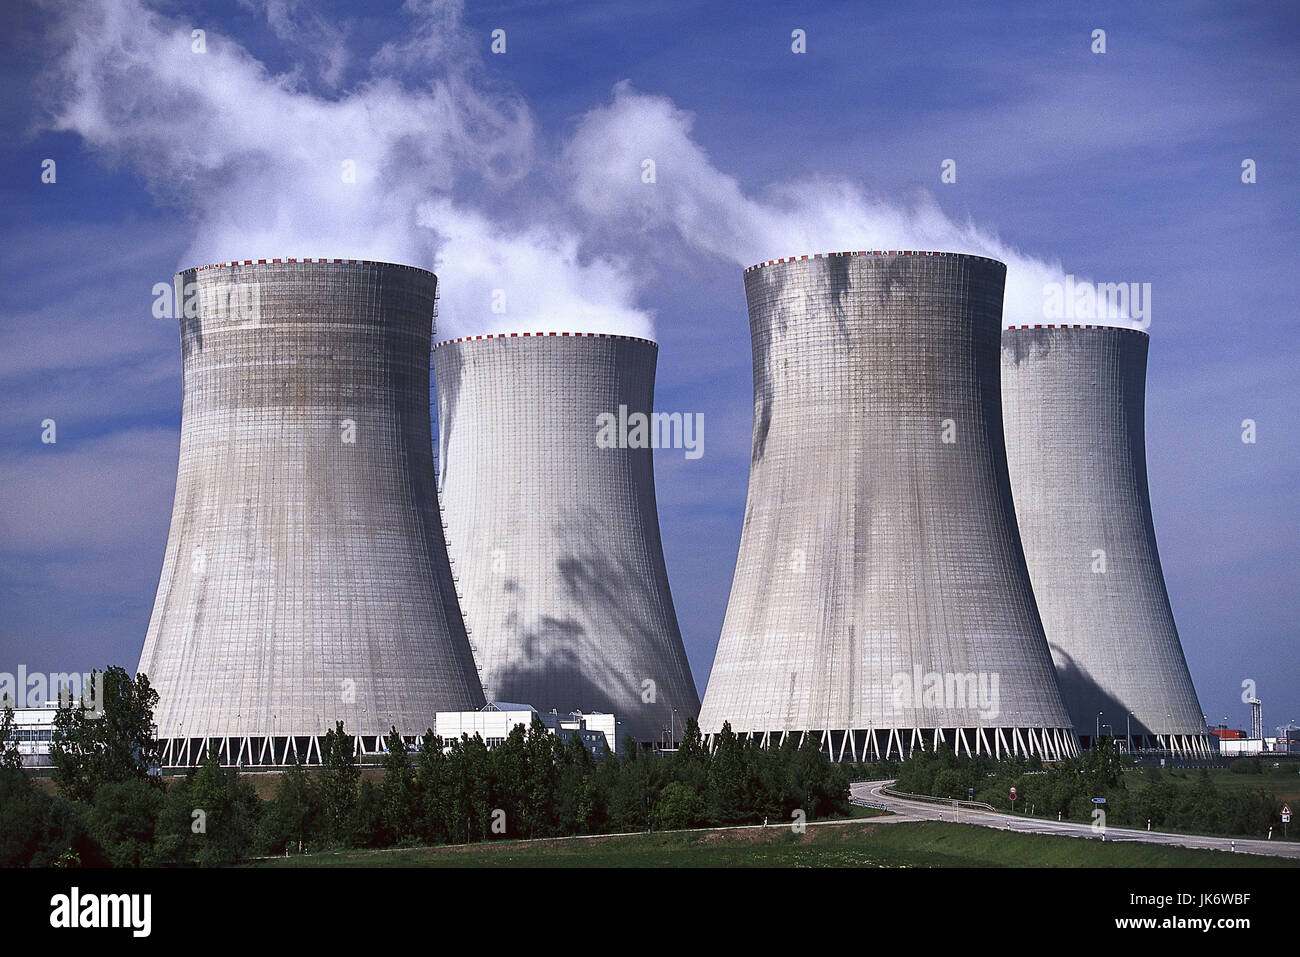 Tschechische Republik, Südböhmen,  Temelin, Atomkraftwerk, Kühltürme  Europa, Osteuropa, Tschechien, - Stock Image